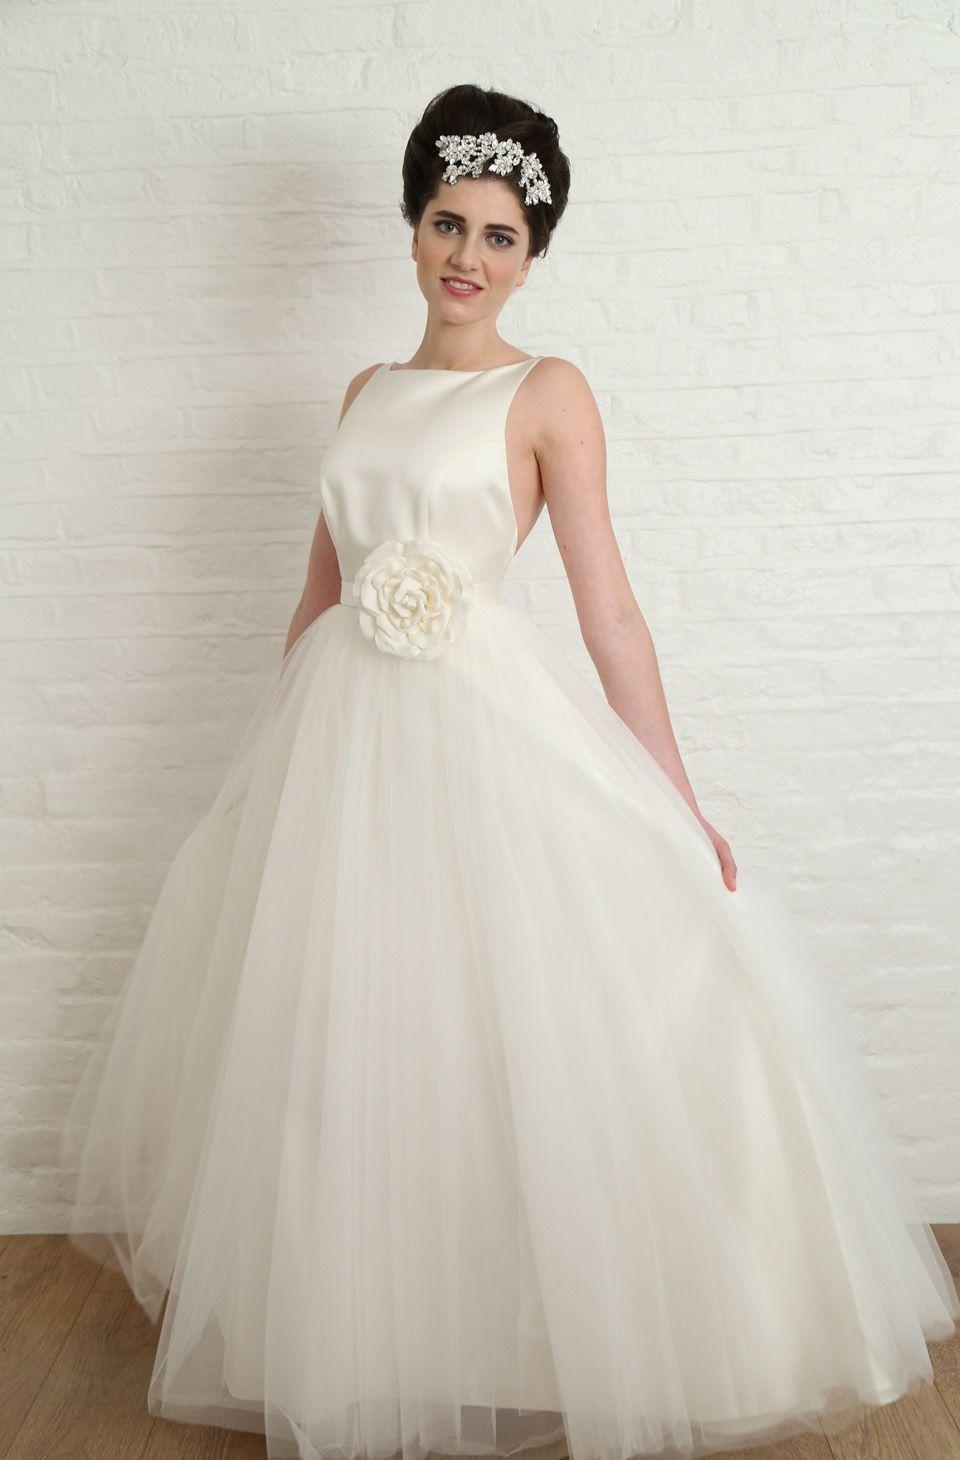 Hazaar Of London Beautiful Surprising Vintage Inspired Wedding Gowns Wedding Dresses Dresses Vintage Inspired Wedding Gown